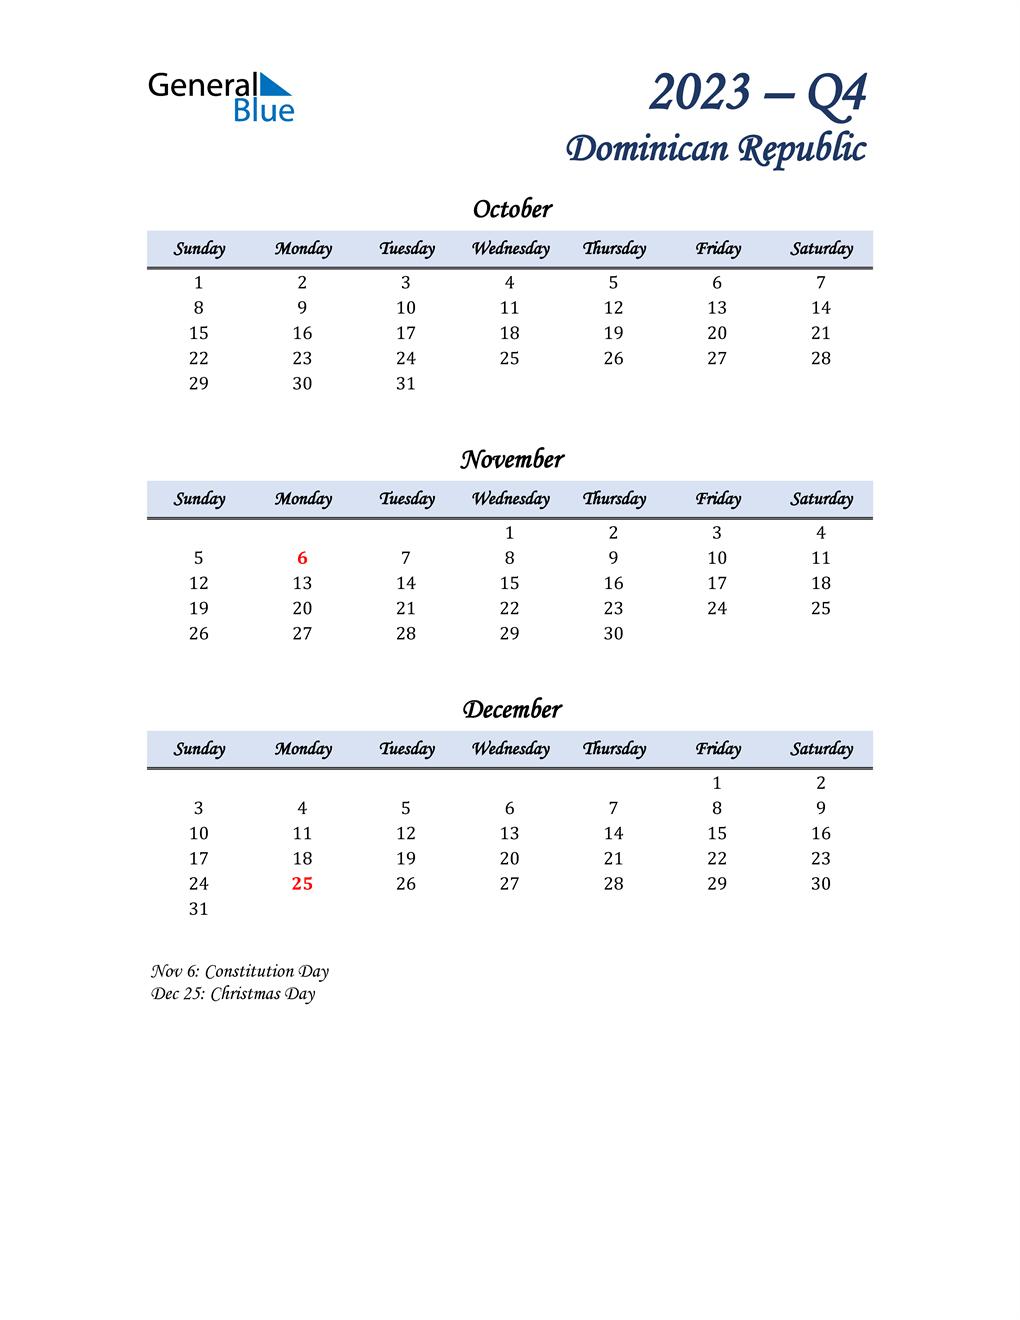 October, November, and December Calendar for Dominican Republic